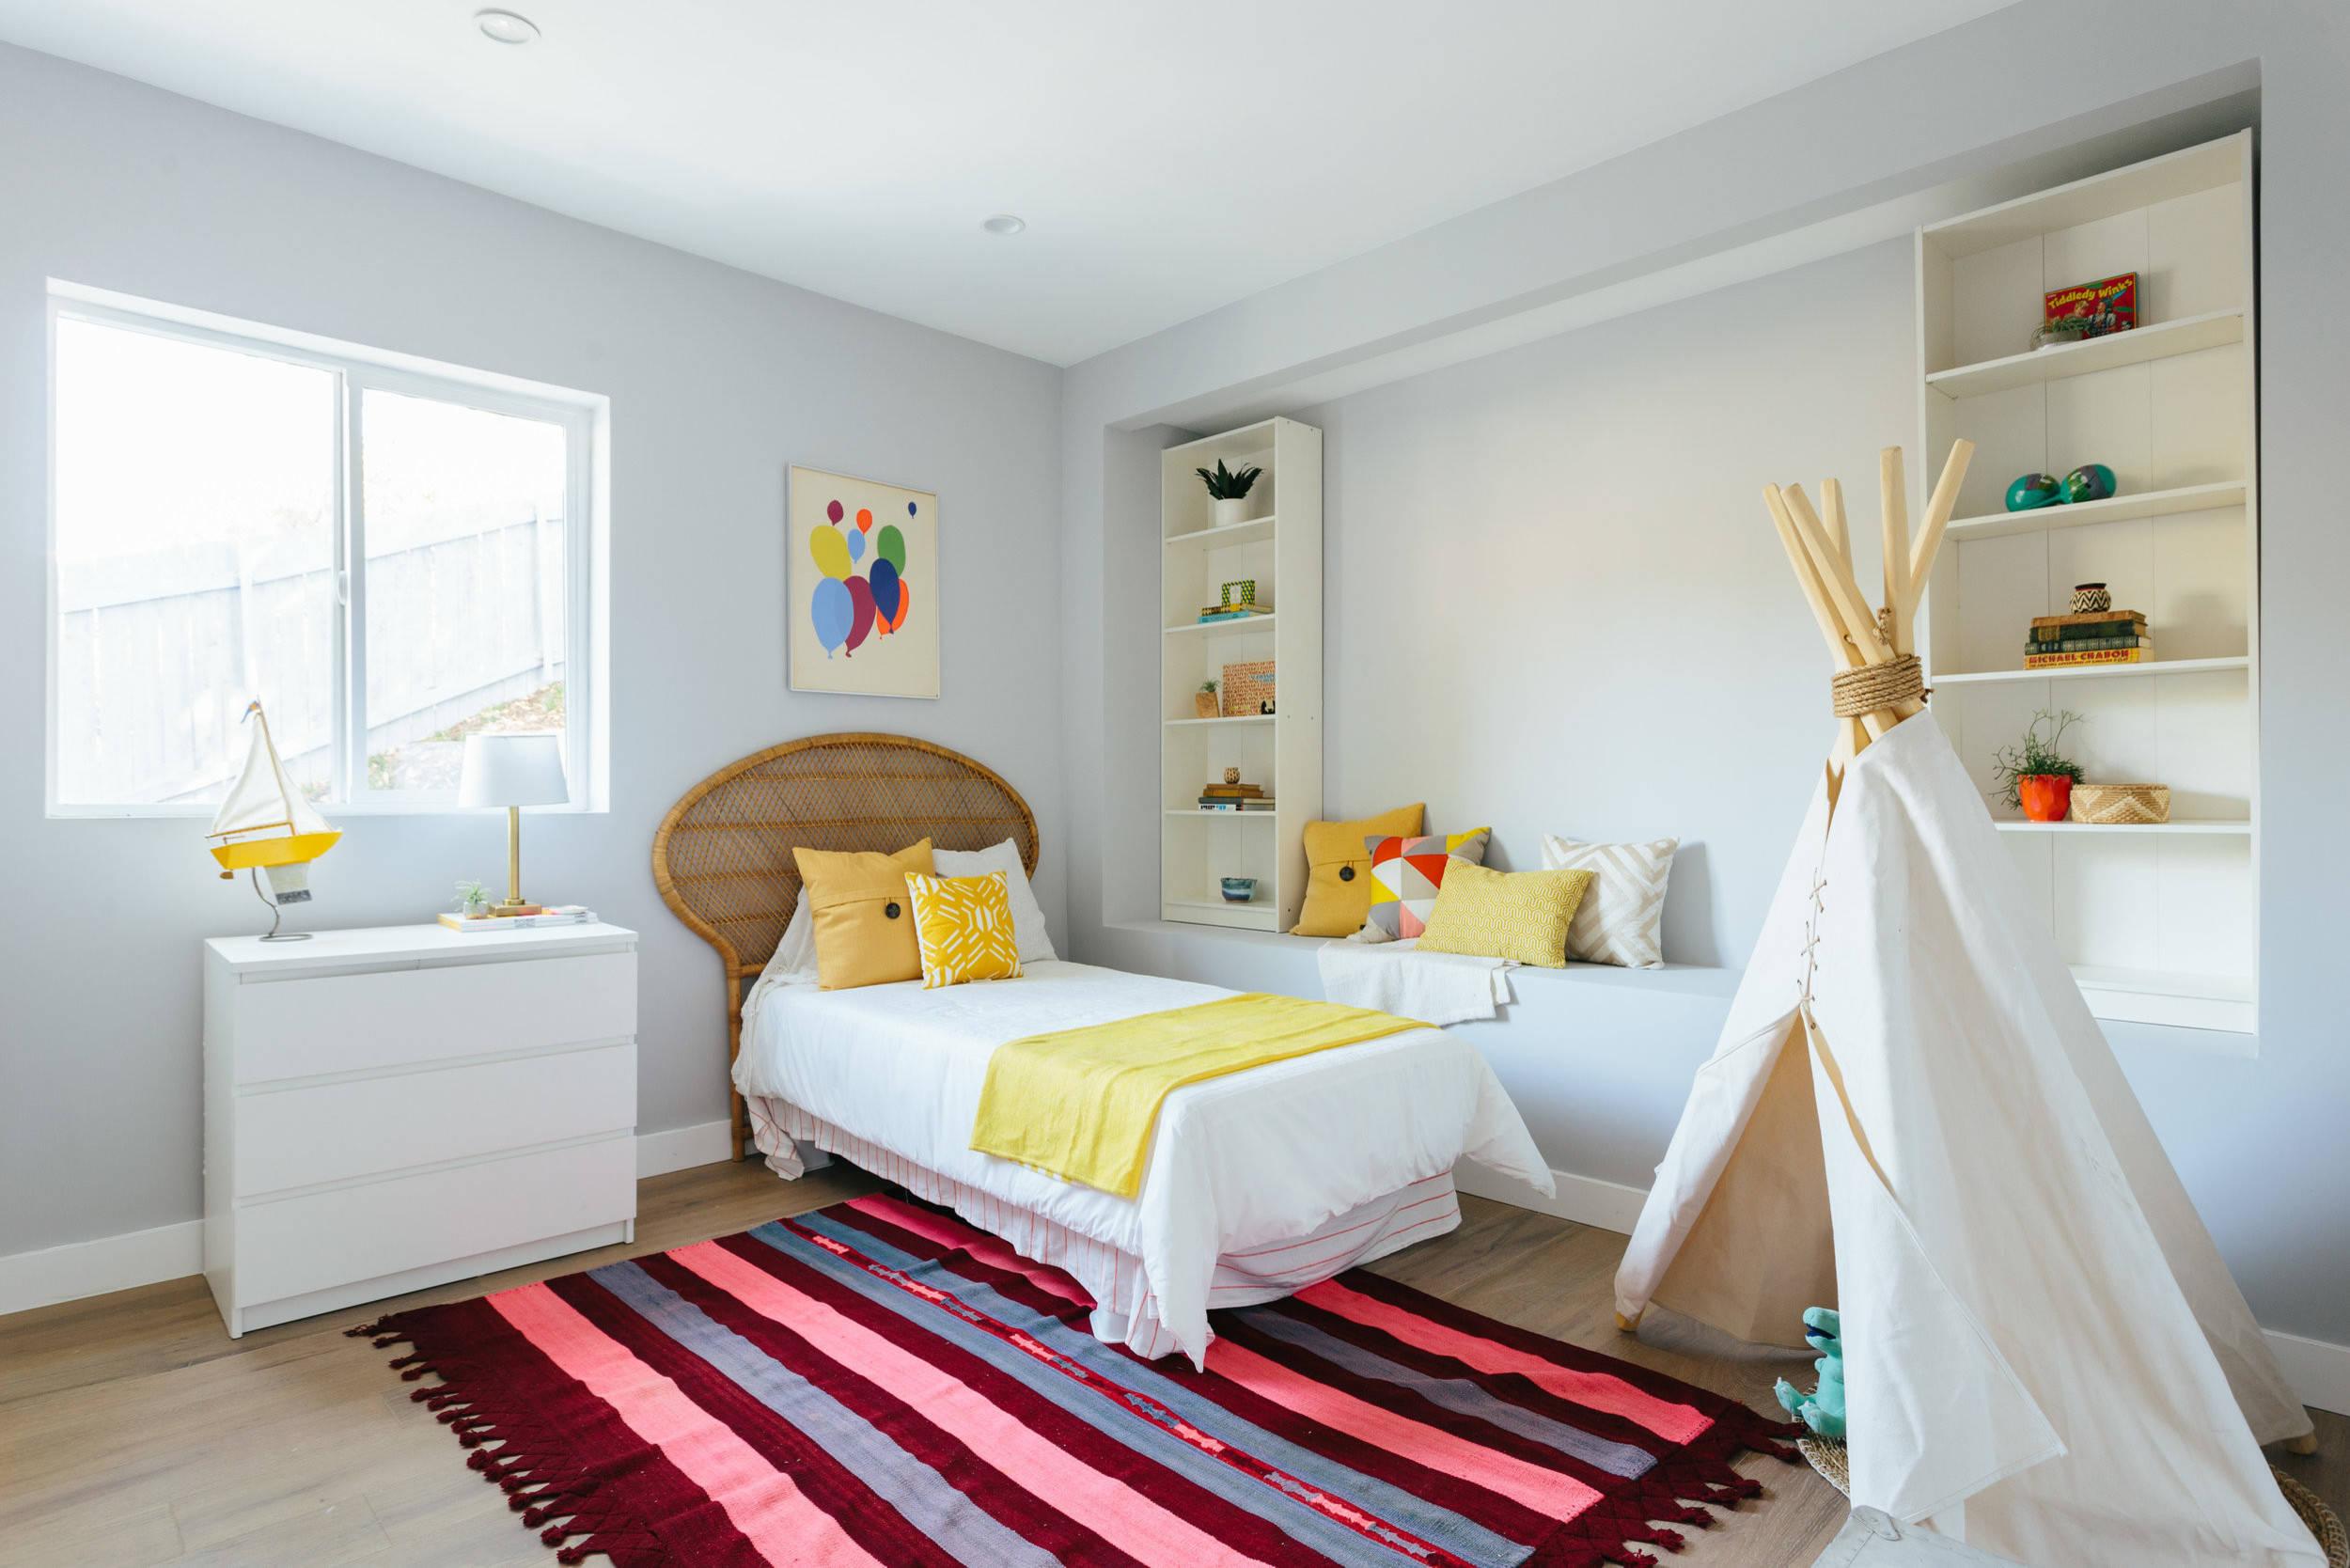 15 Beautiful Scandinavian Kids' Room Designs That Provide ...